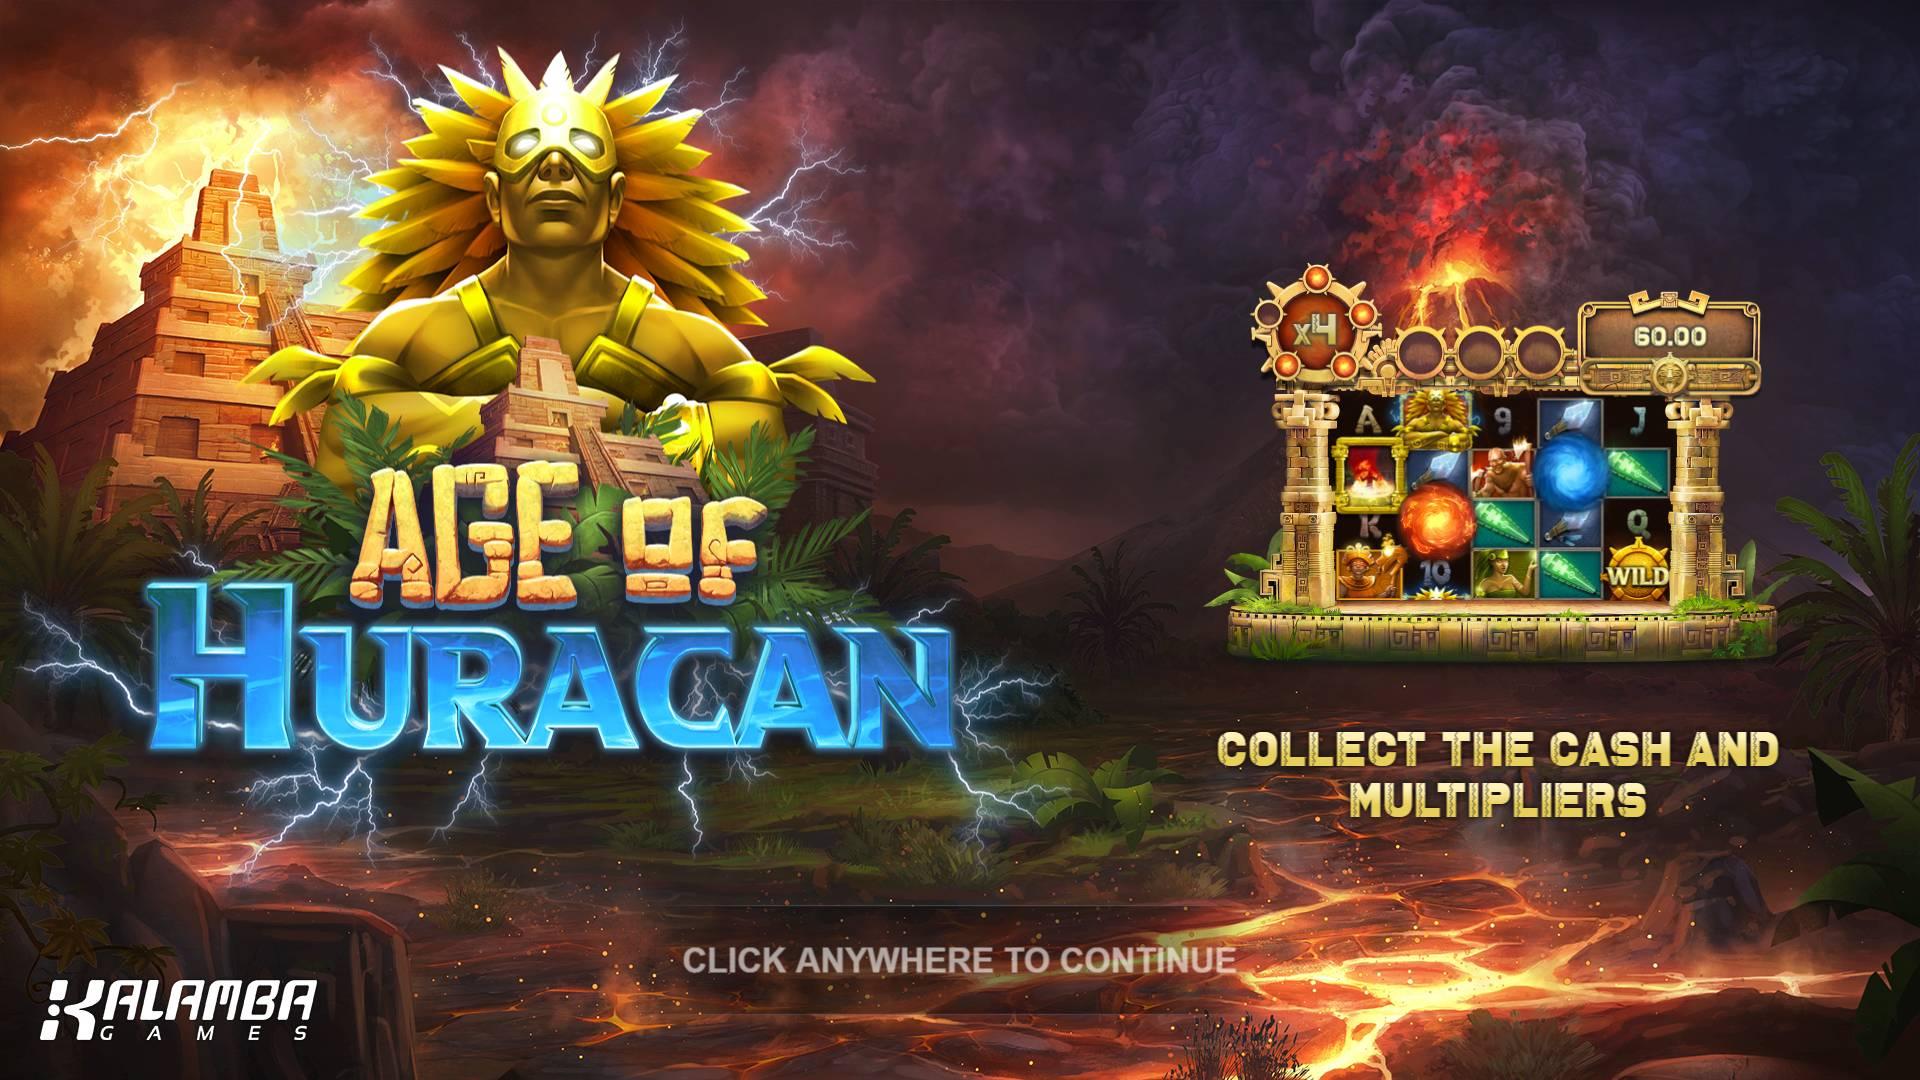 Age of Huracan Screenshot